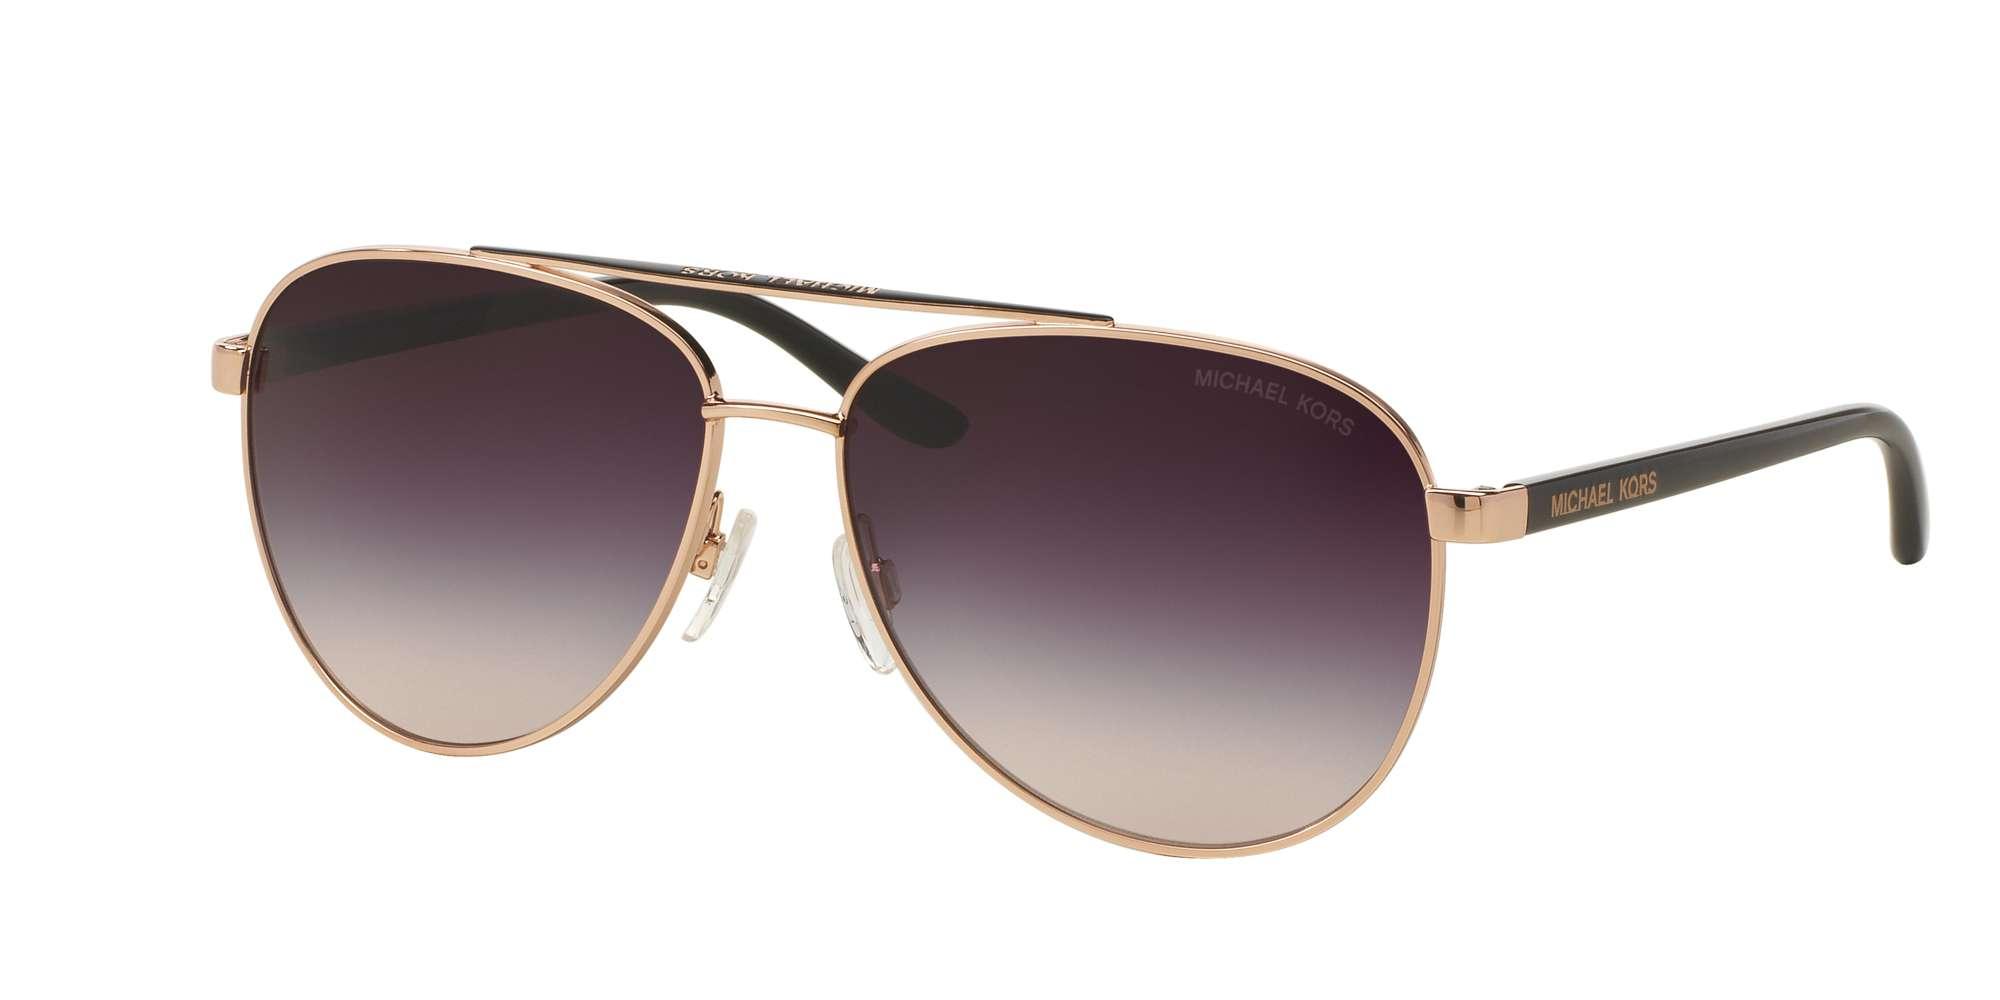 ROSE GOLD / GREY ROSE GRADIENT lenses